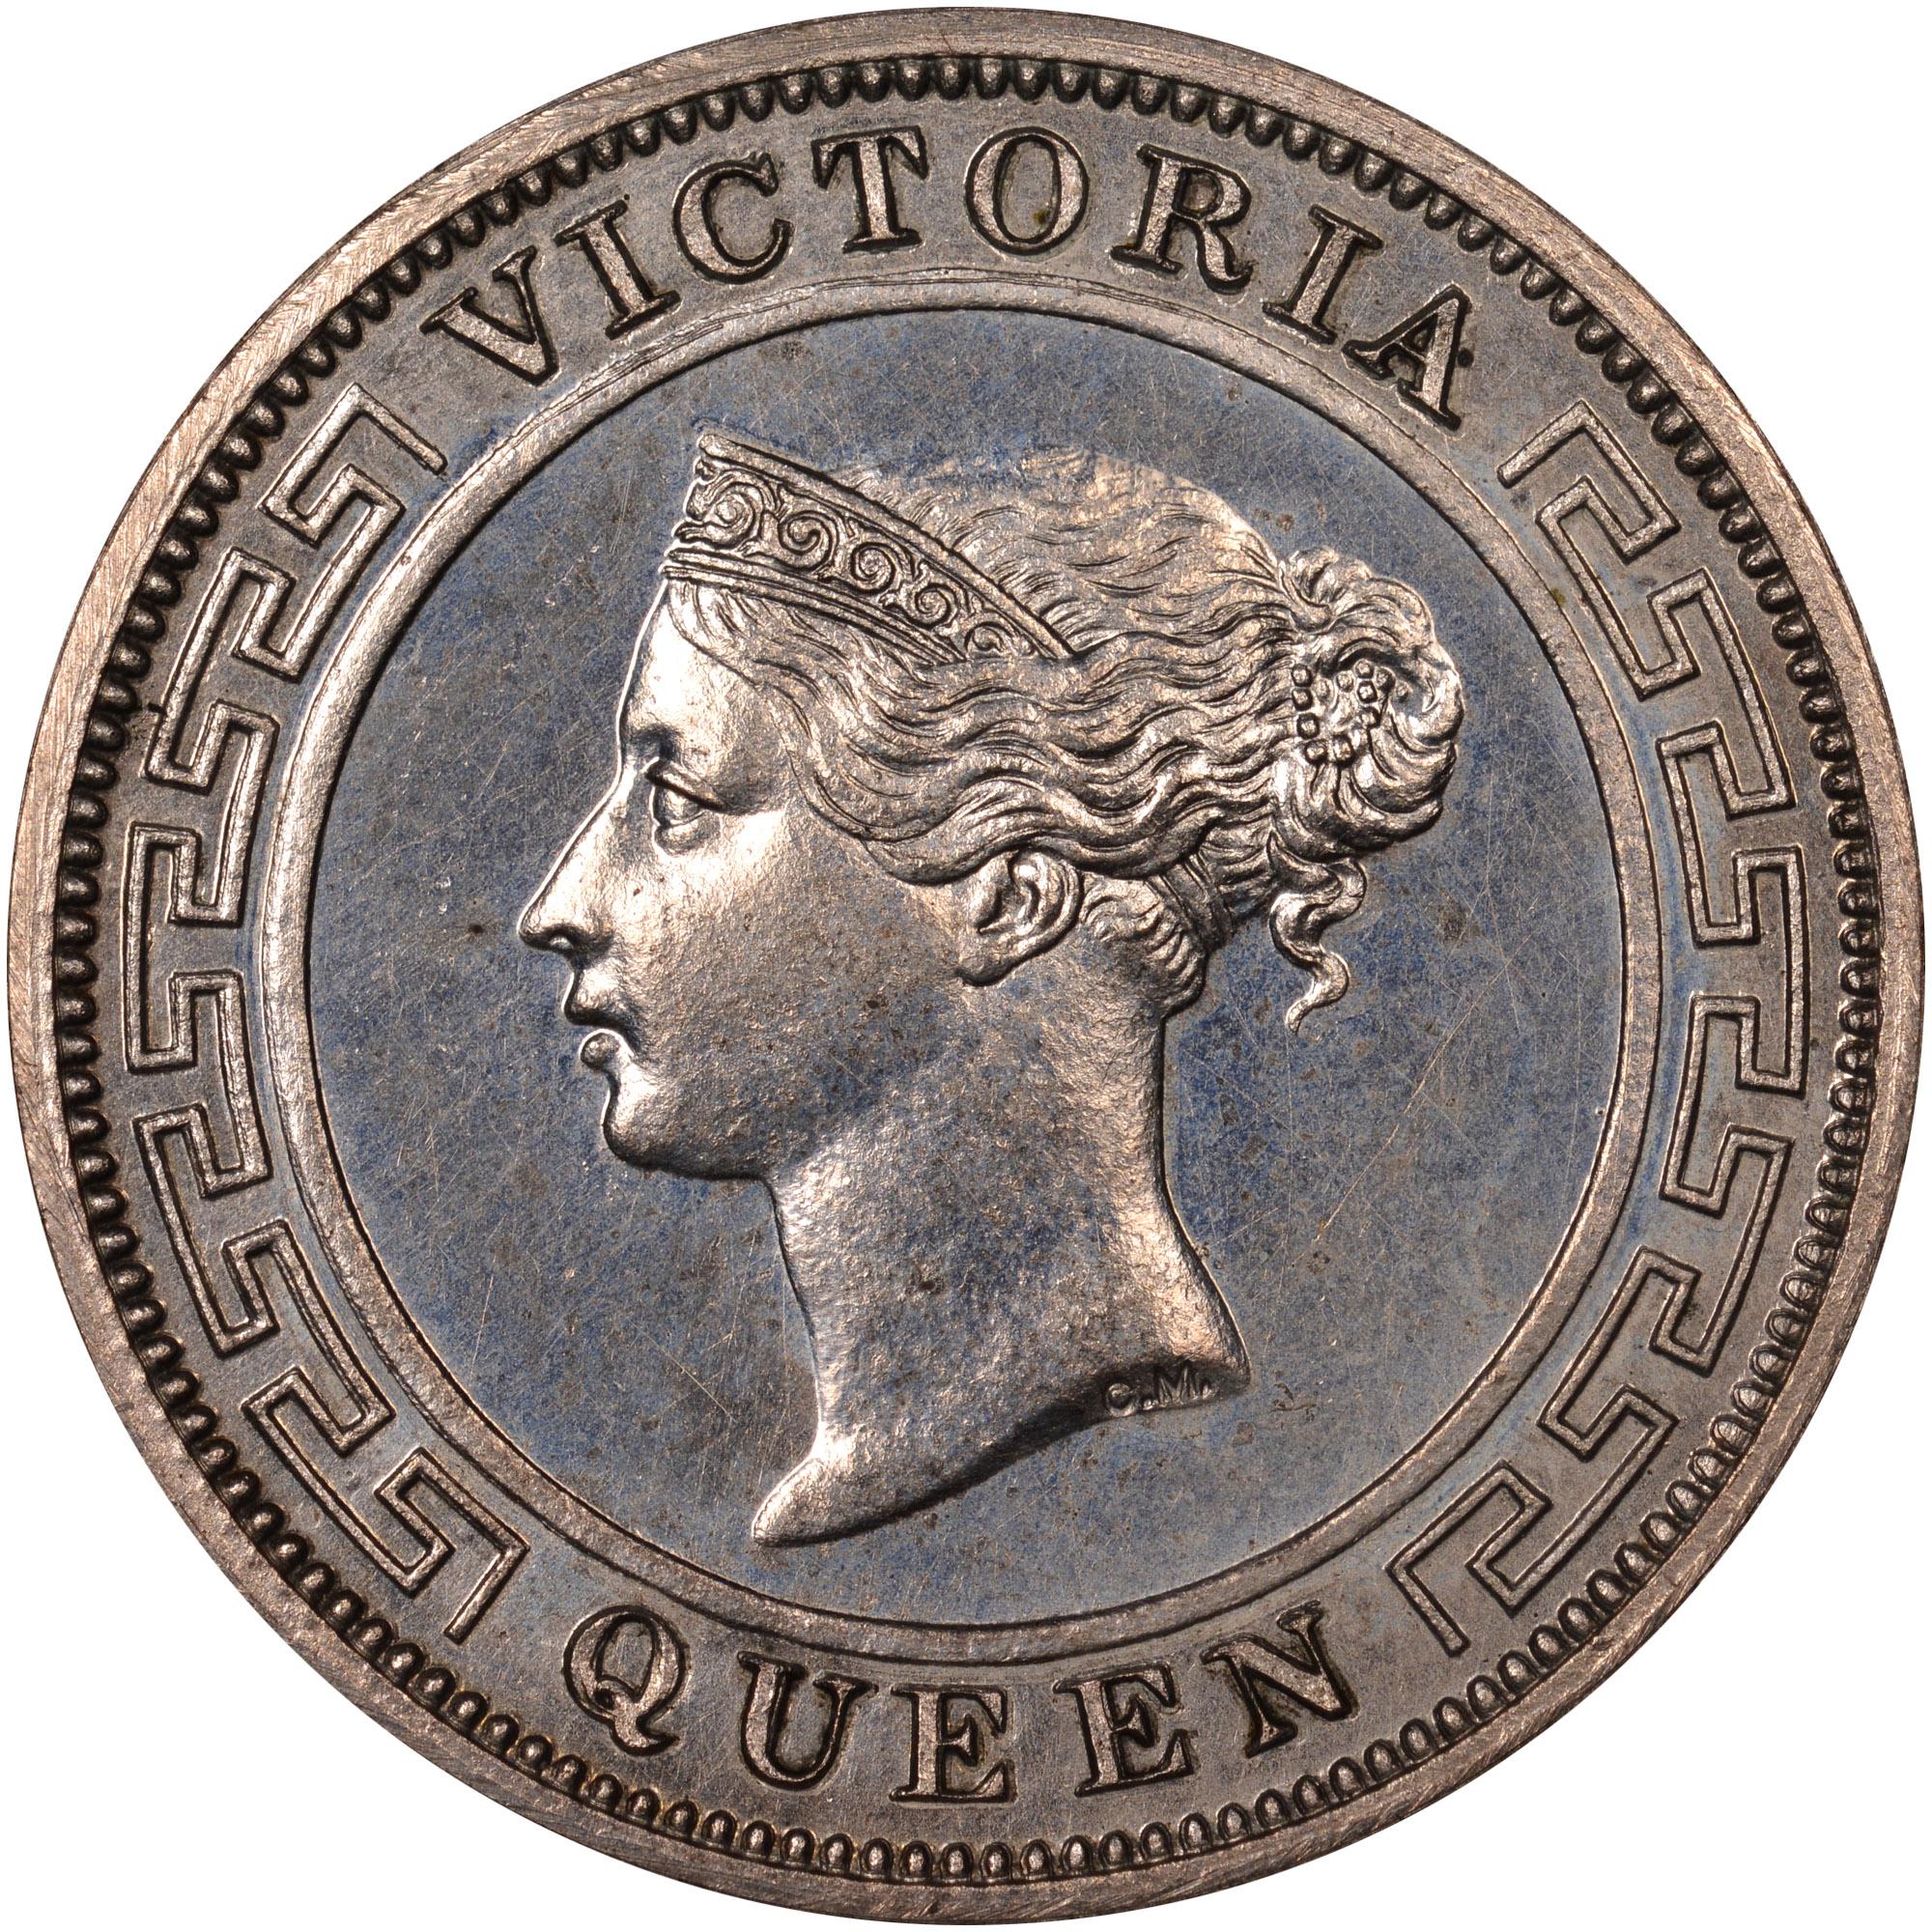 1870-1892 Ceylon Cent obverse